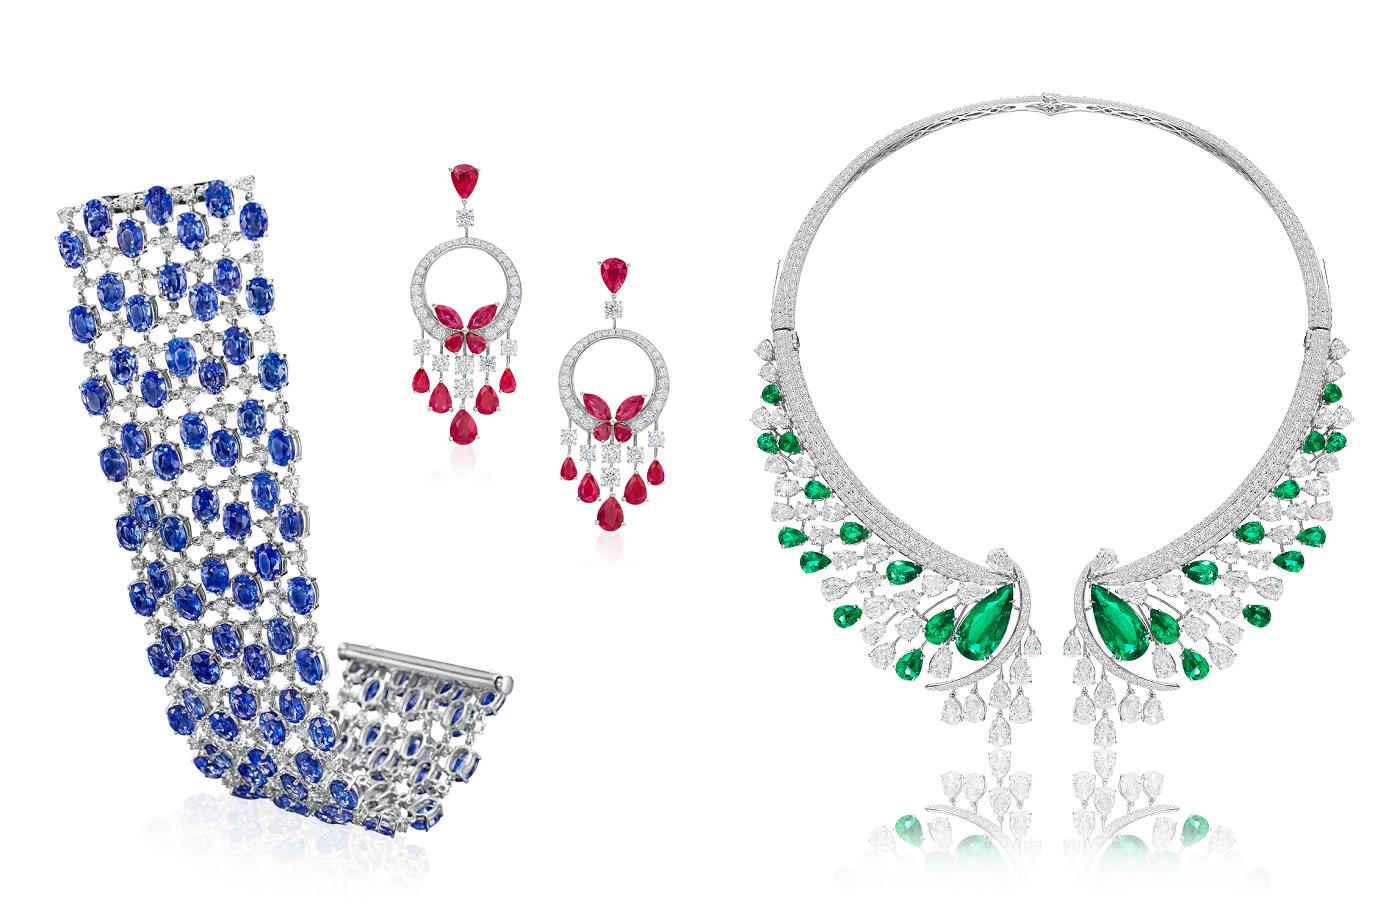 Precious Gemstones: The Value of Ruby, Sapphire & Emerald